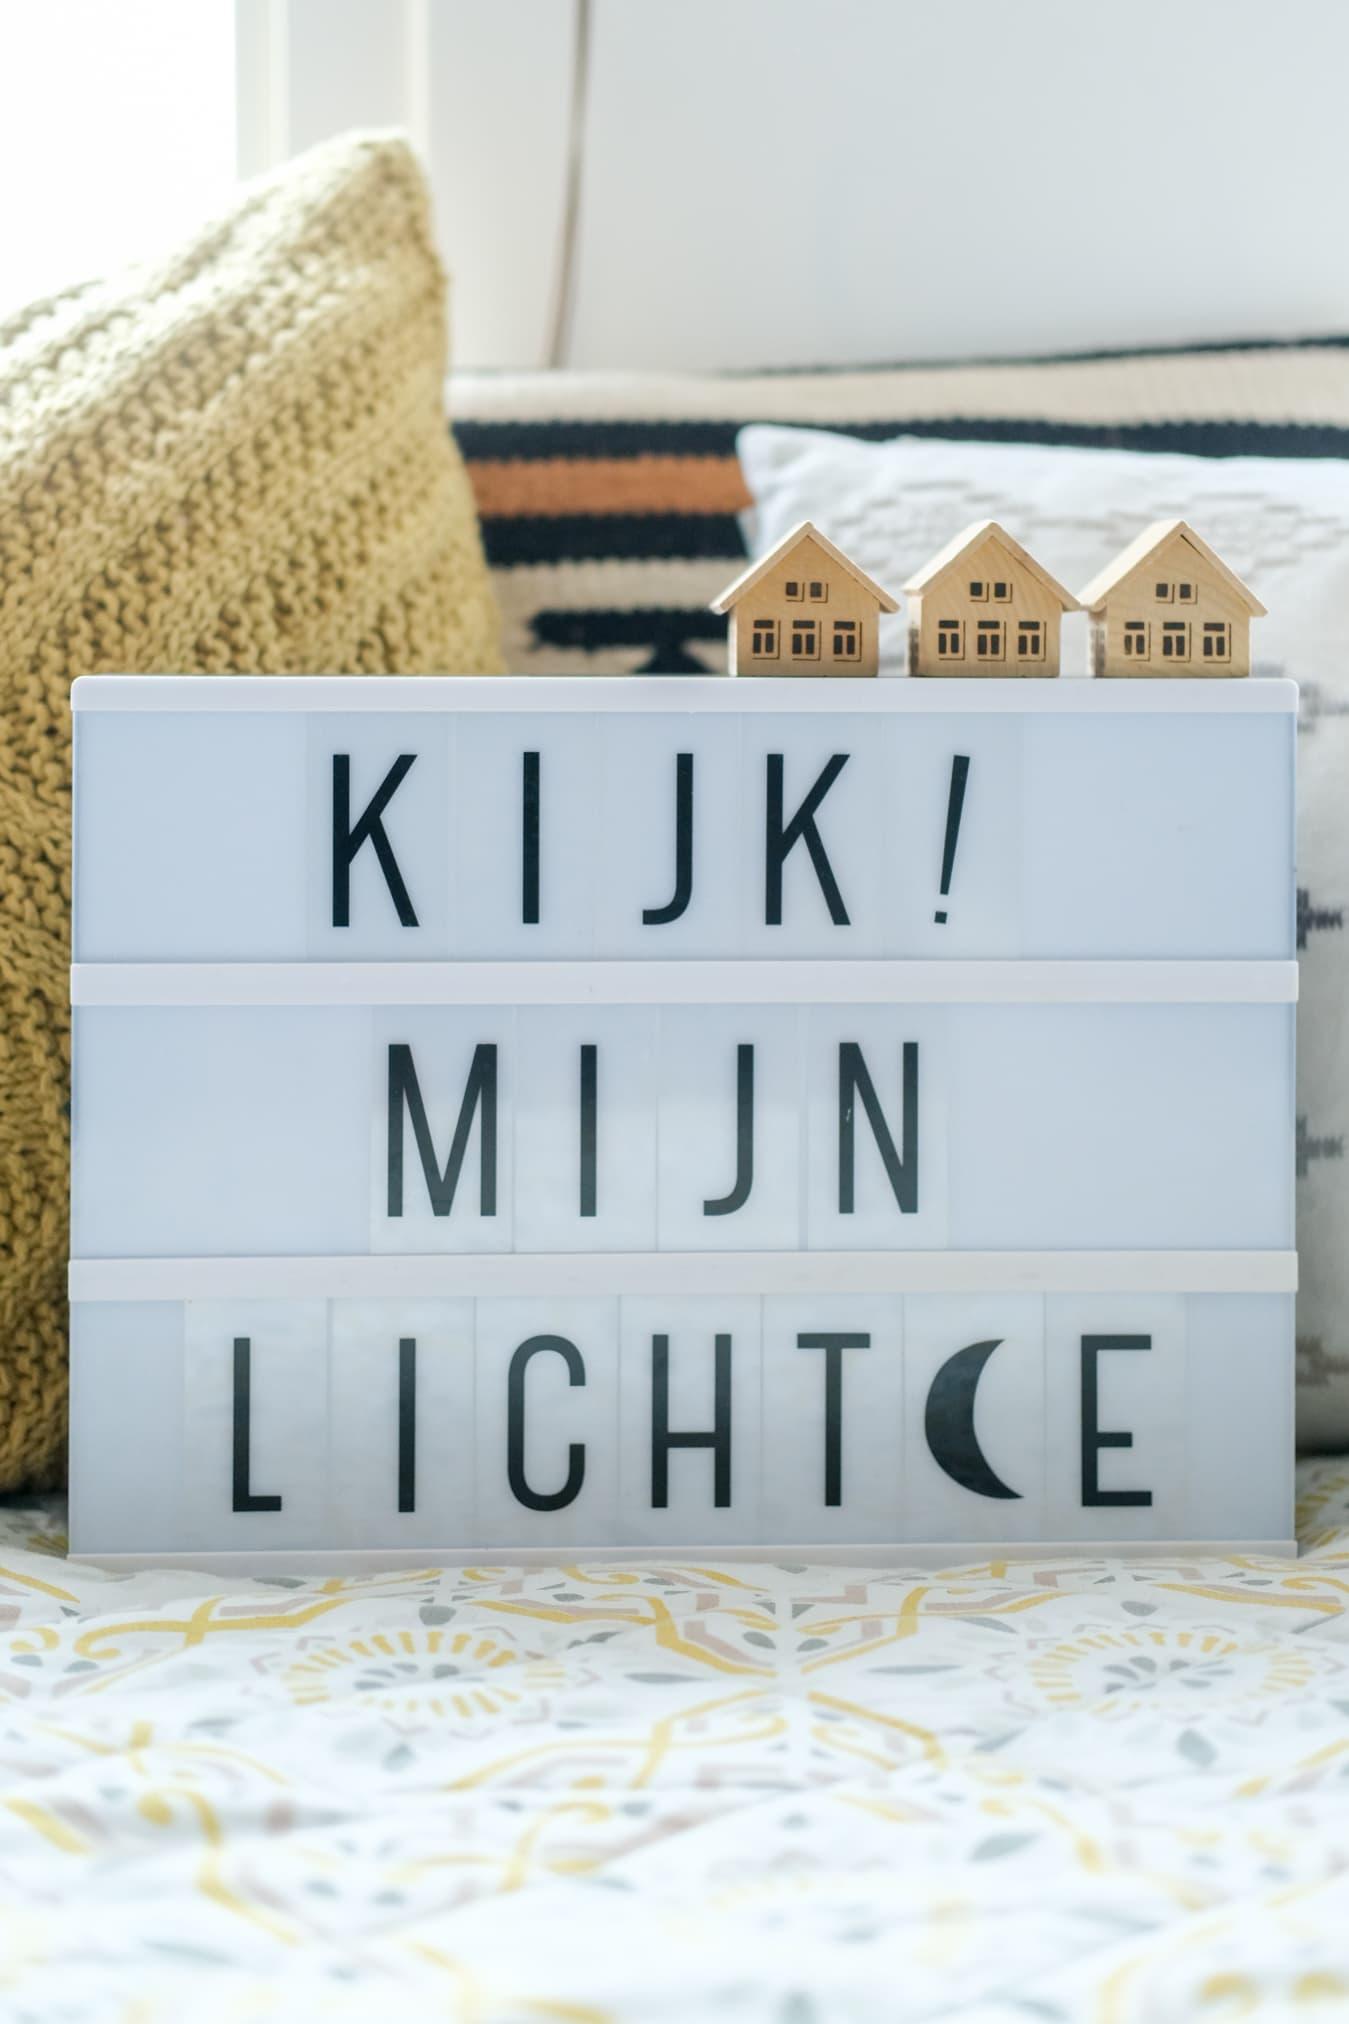 lightbox tekst sint maarten